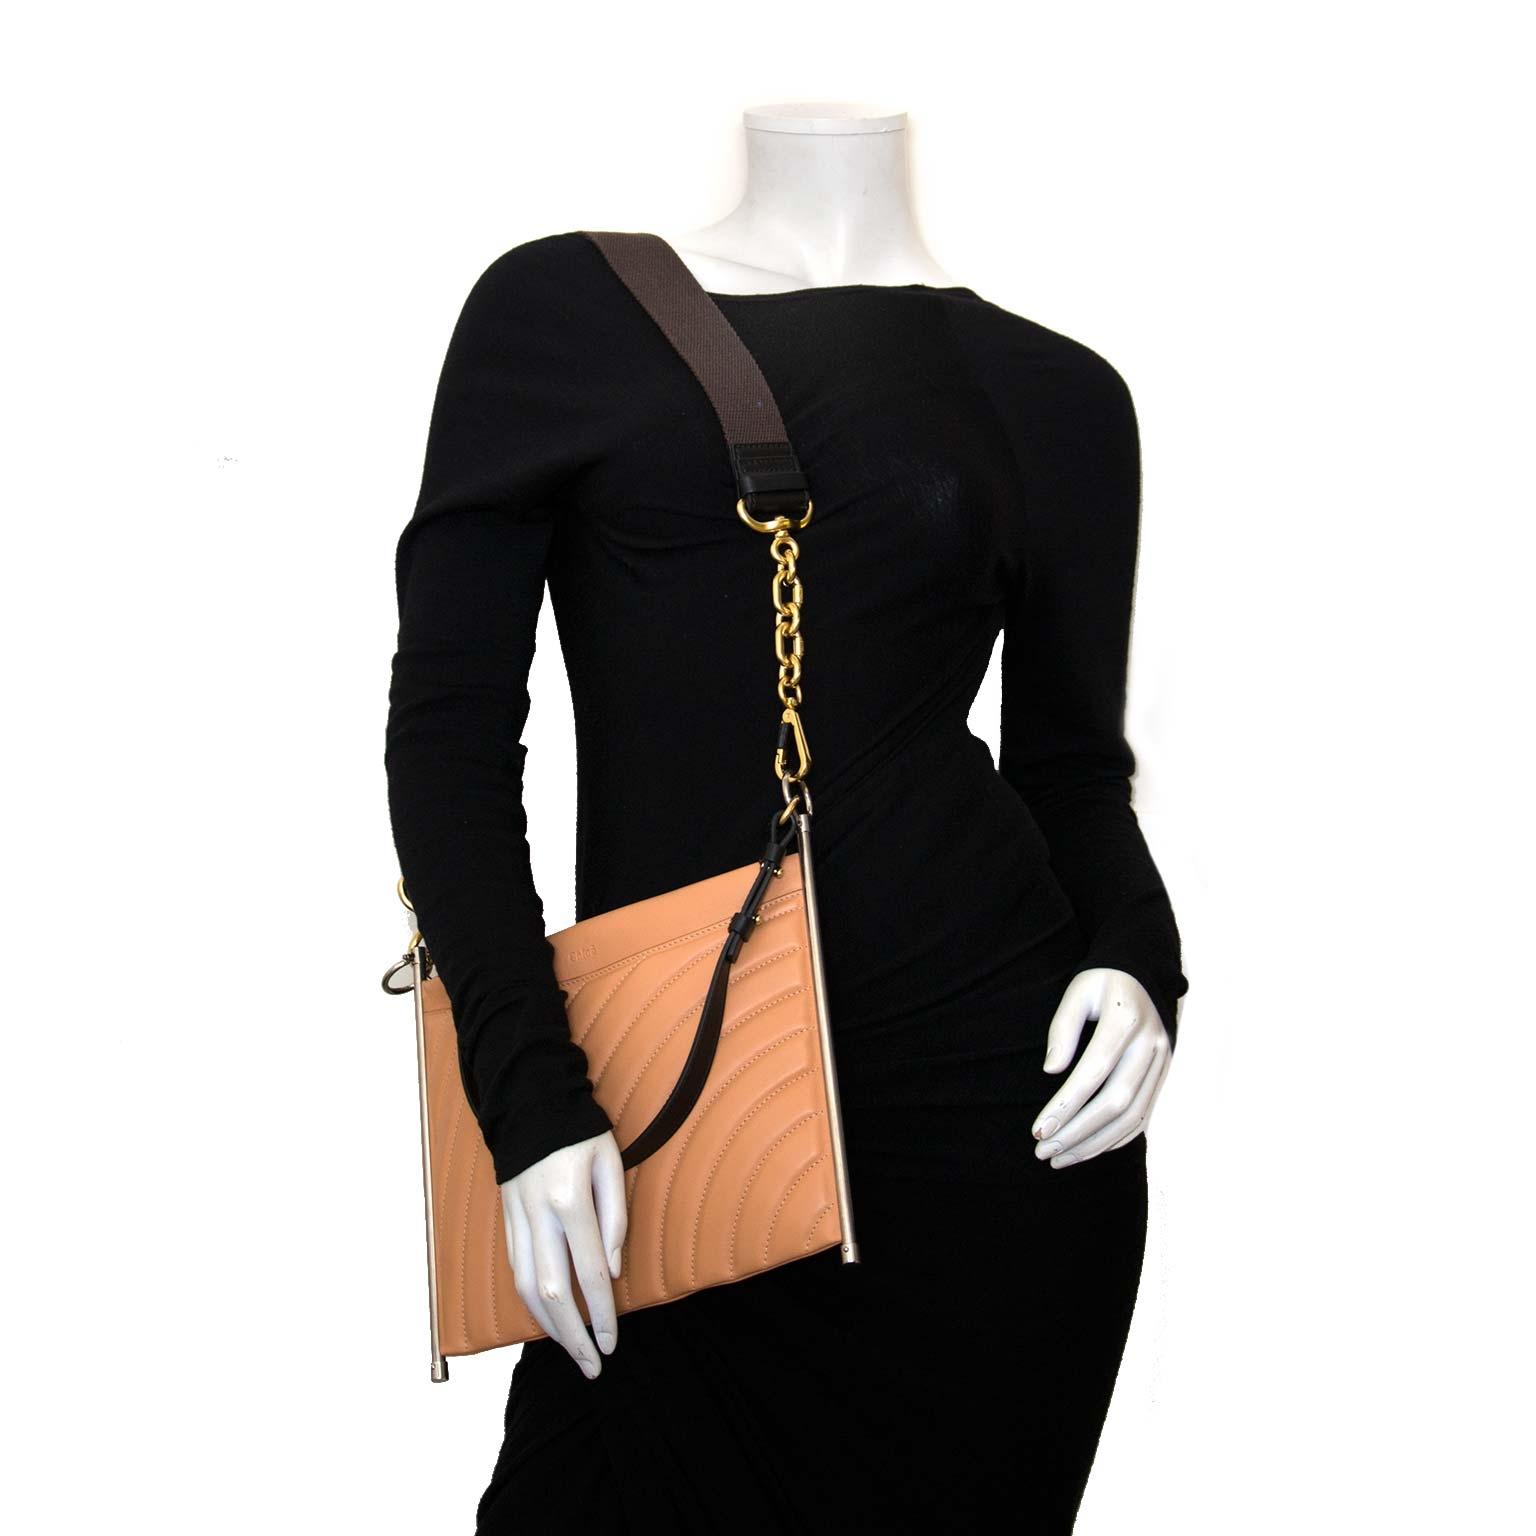 koop authentieke chloé blushy pink schouder tas bij labellov vintage mode webshop belgië